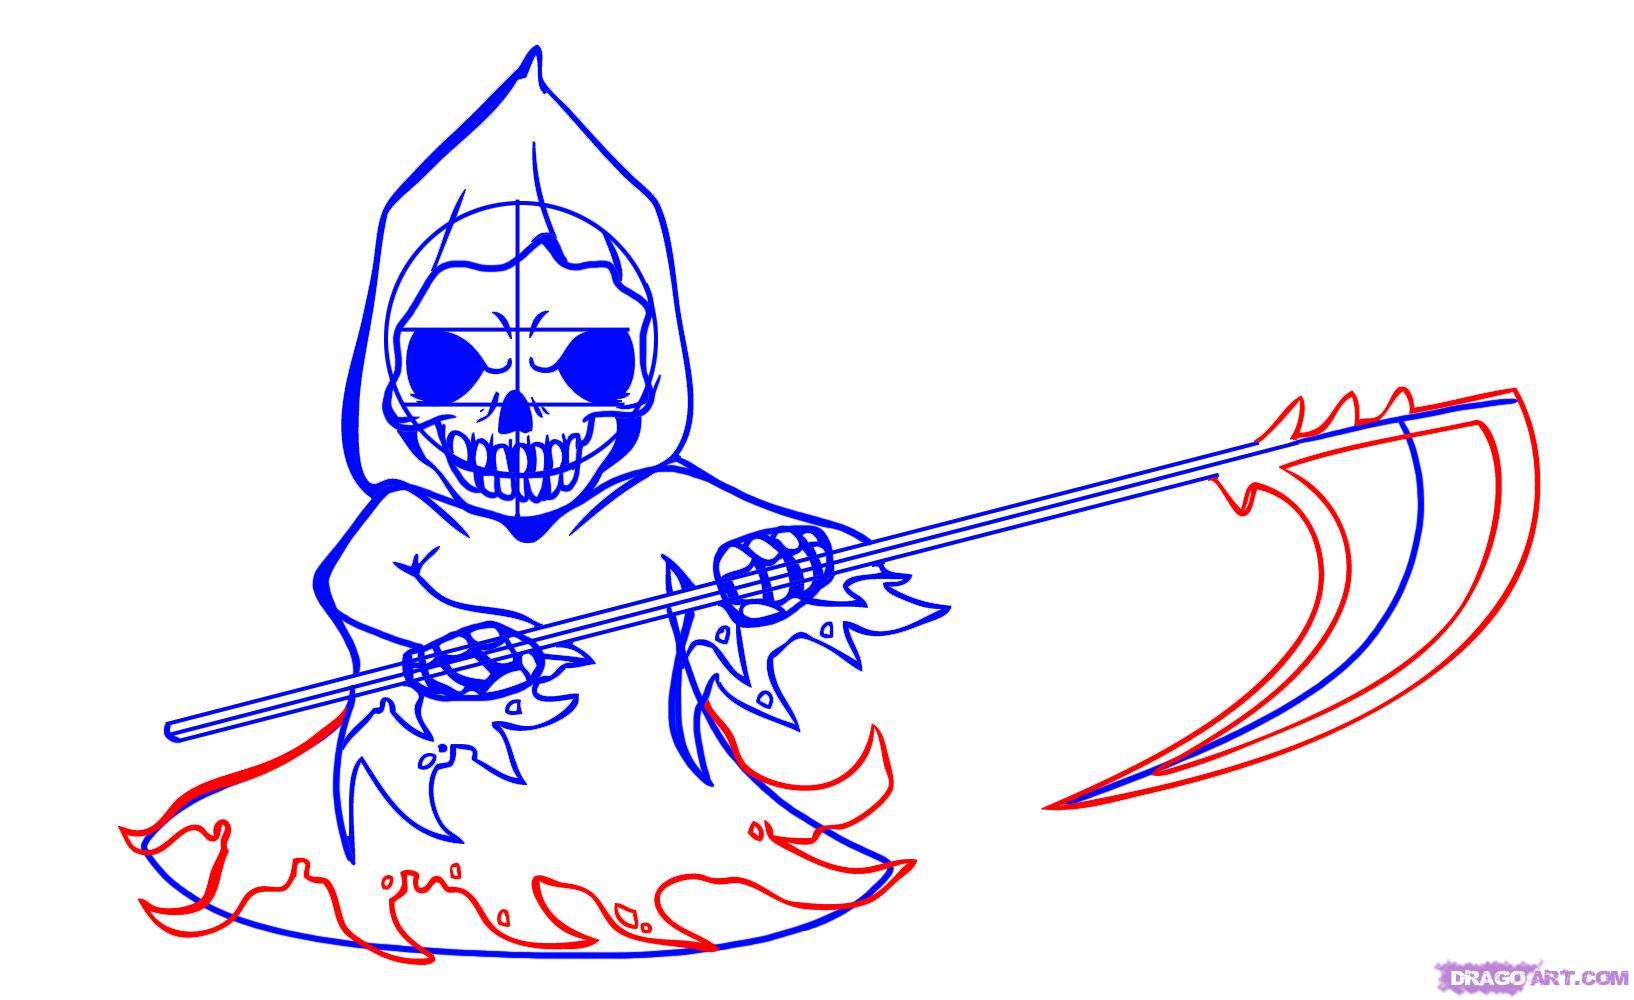 Drawn scythe red Step Chibi chibi Chibis reaper